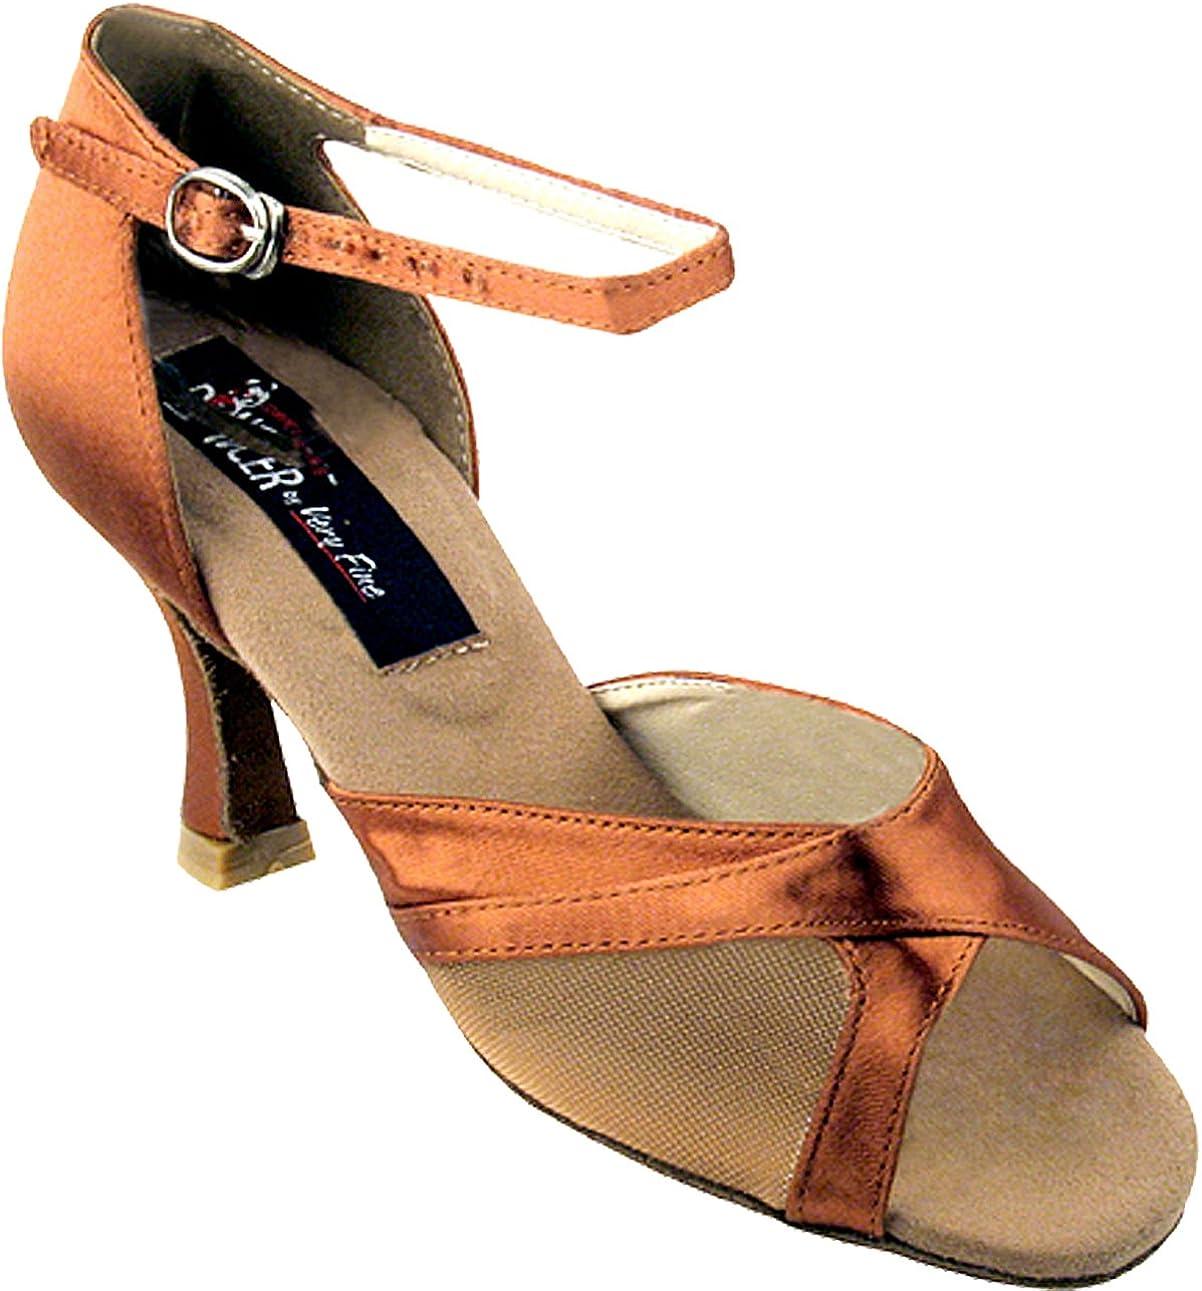 Very Fine Women's Salsa Ballroom Tango Dance Shoes CD2076 Bundle with Back-of-Heel Cushions, Dark Tan Satin 5 M US 3